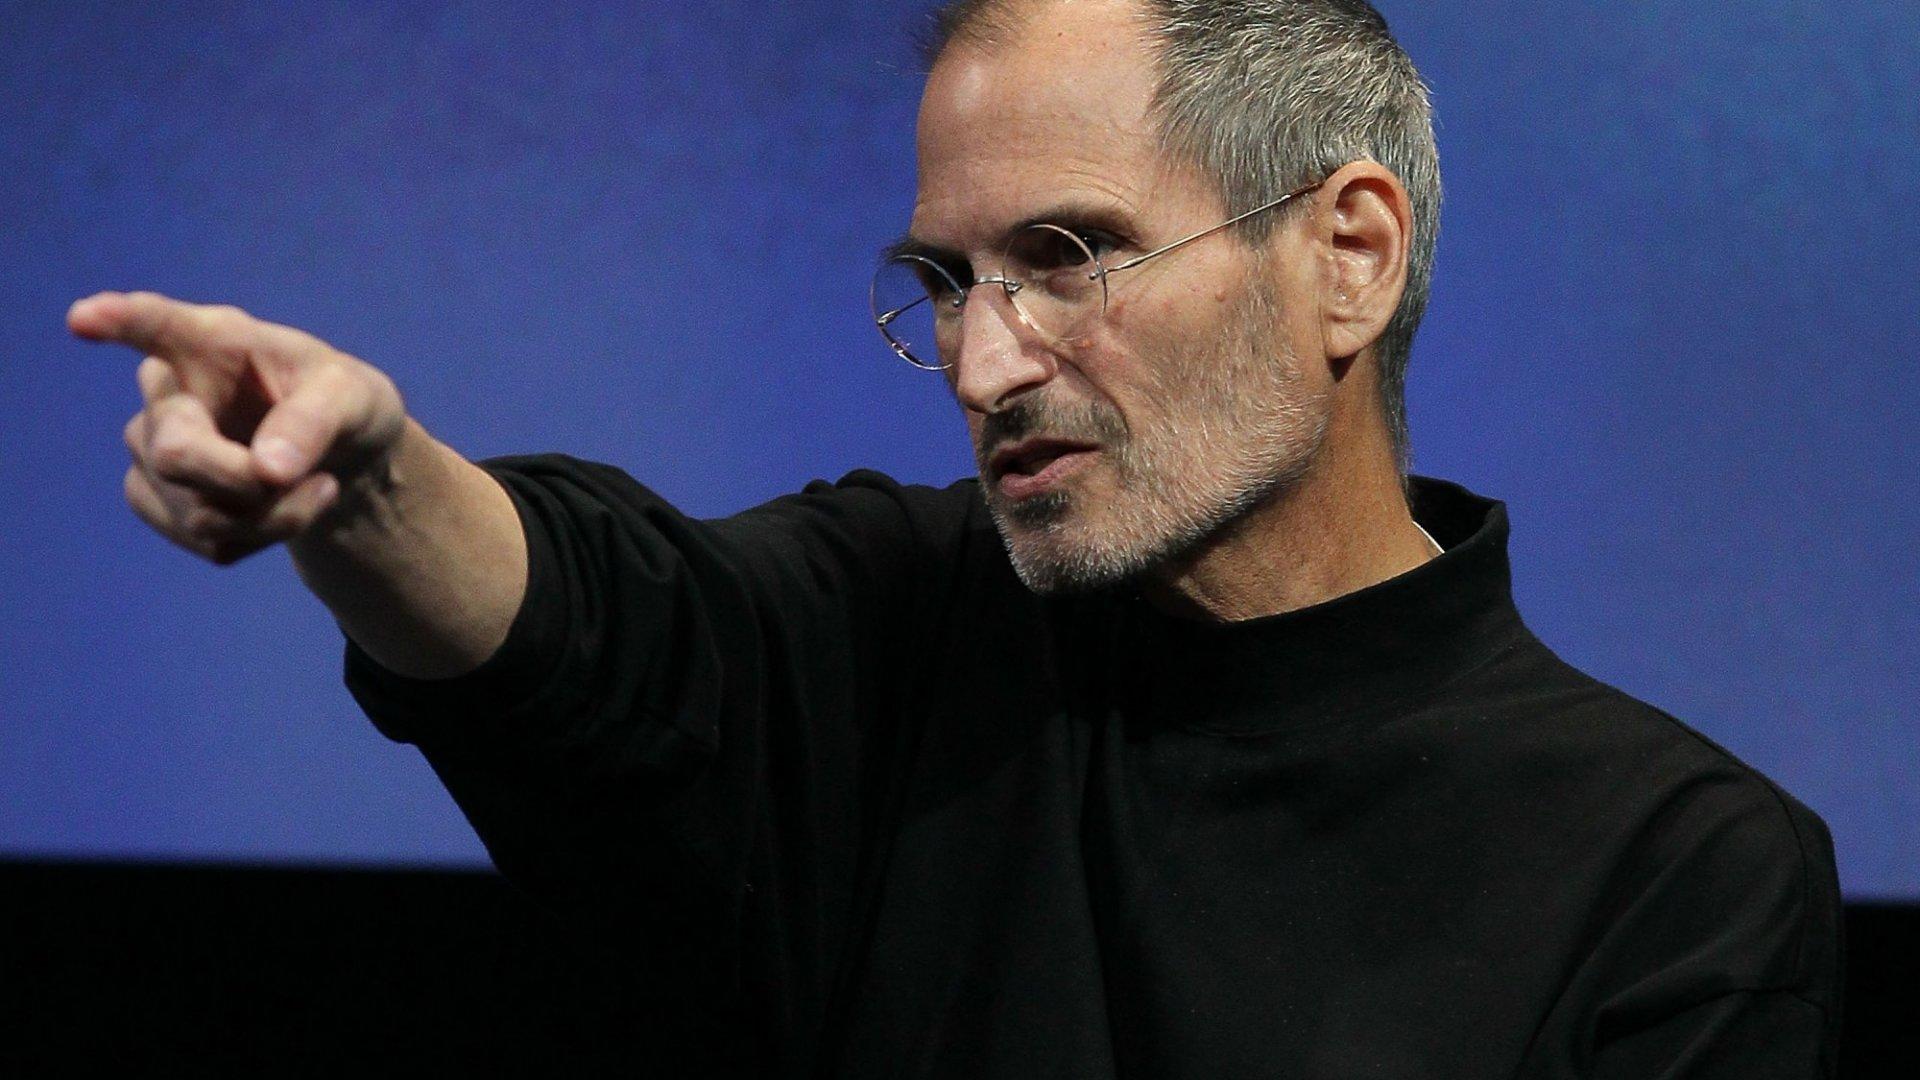 The 1 Leadership Quality Steve Jobs, Elon Musk, and Marc Benioff All Share